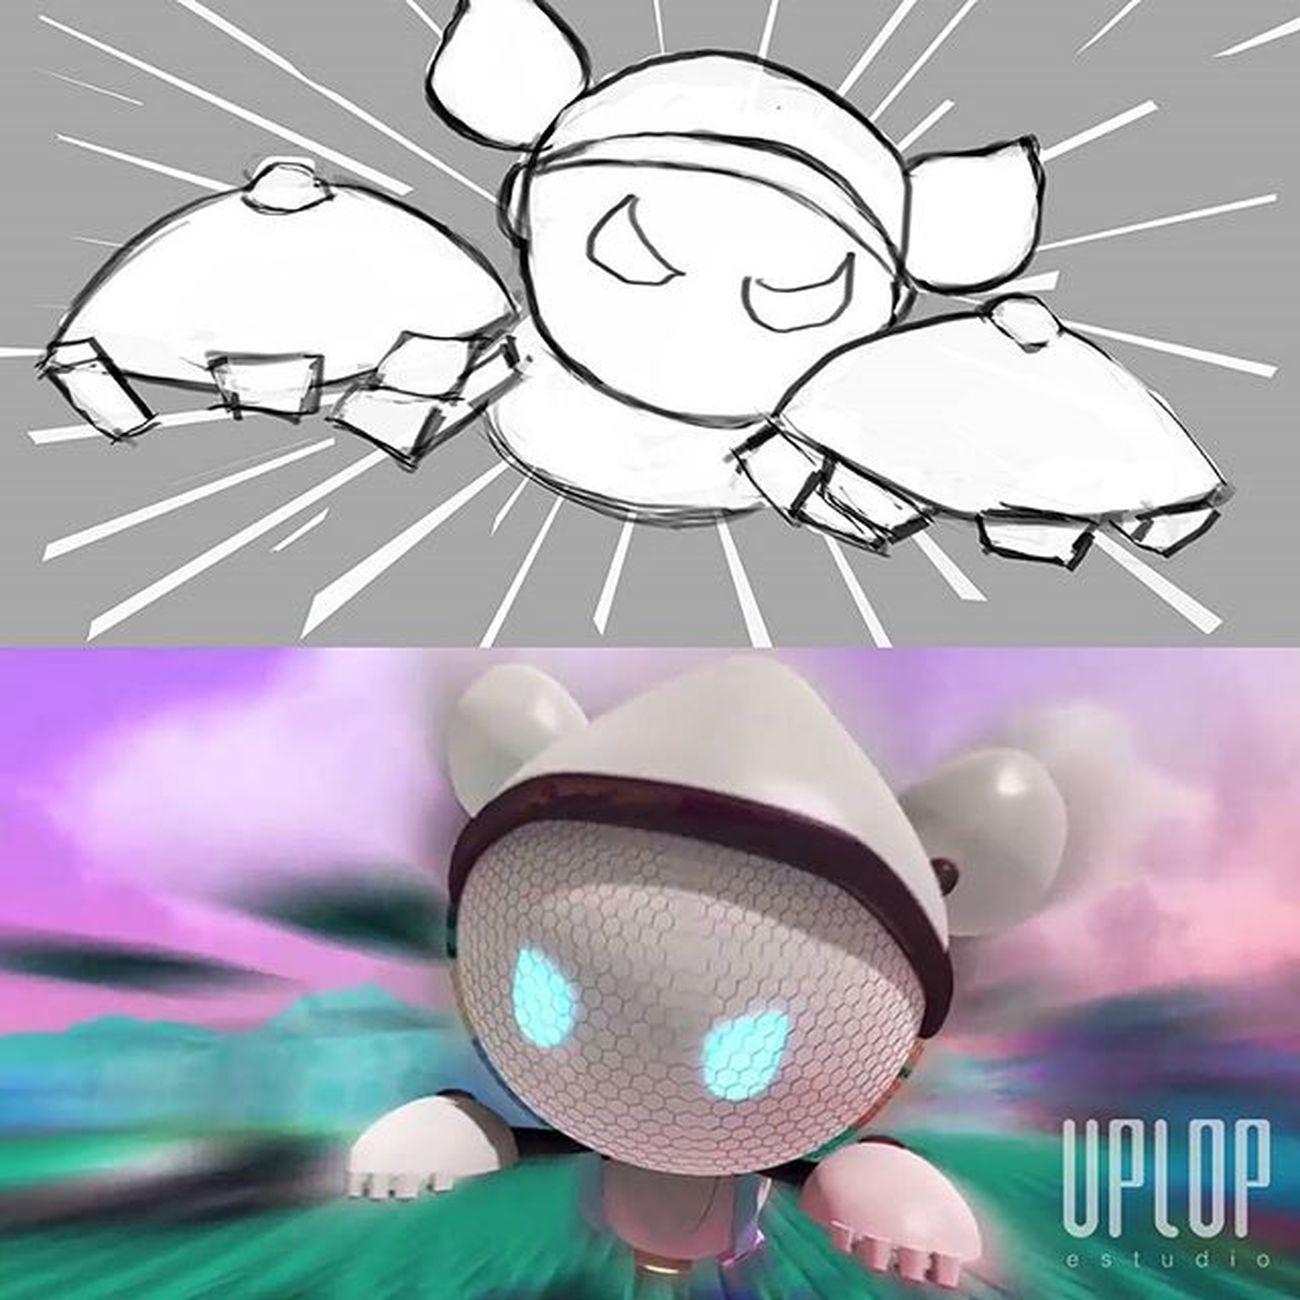 Coming soon... Uplop Studio Animation Tv Animated Series Project Tec Storyboard Workprogress Render Blender3d Blender Animatic 3D 2d IgersVenezuela Igersmerida